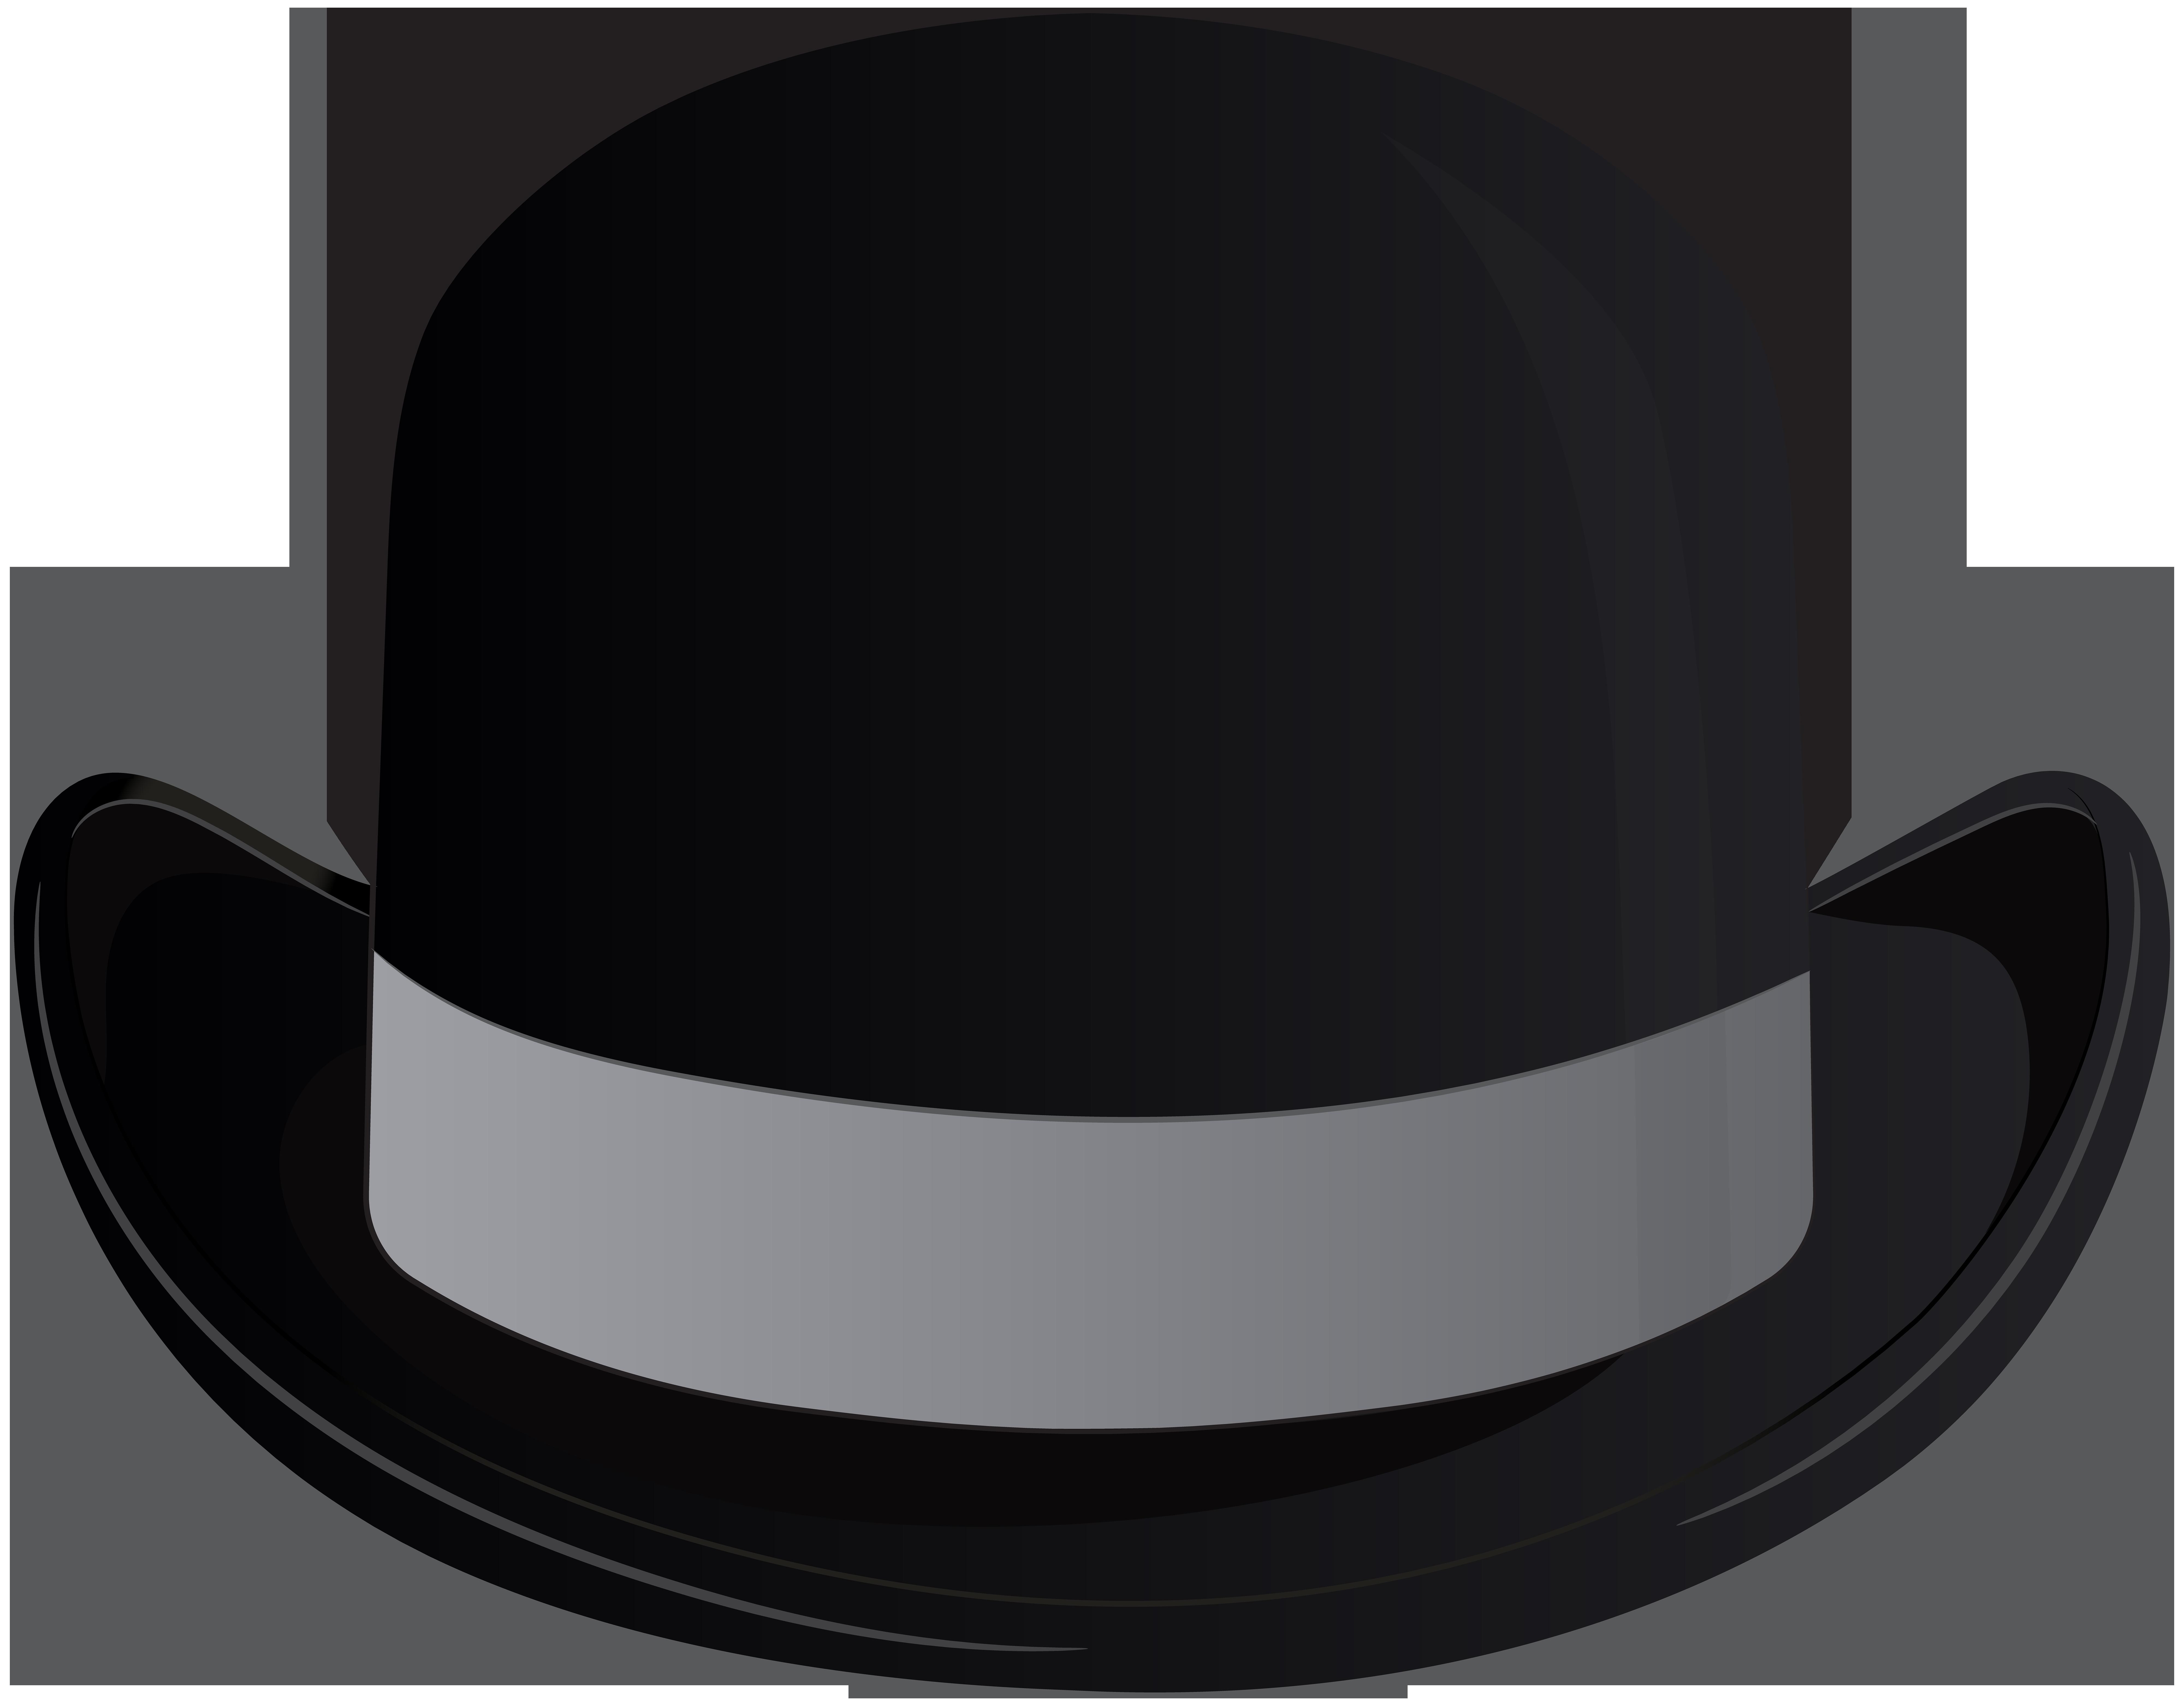 Bowler Hat Transparent Clip Art PNG Image.